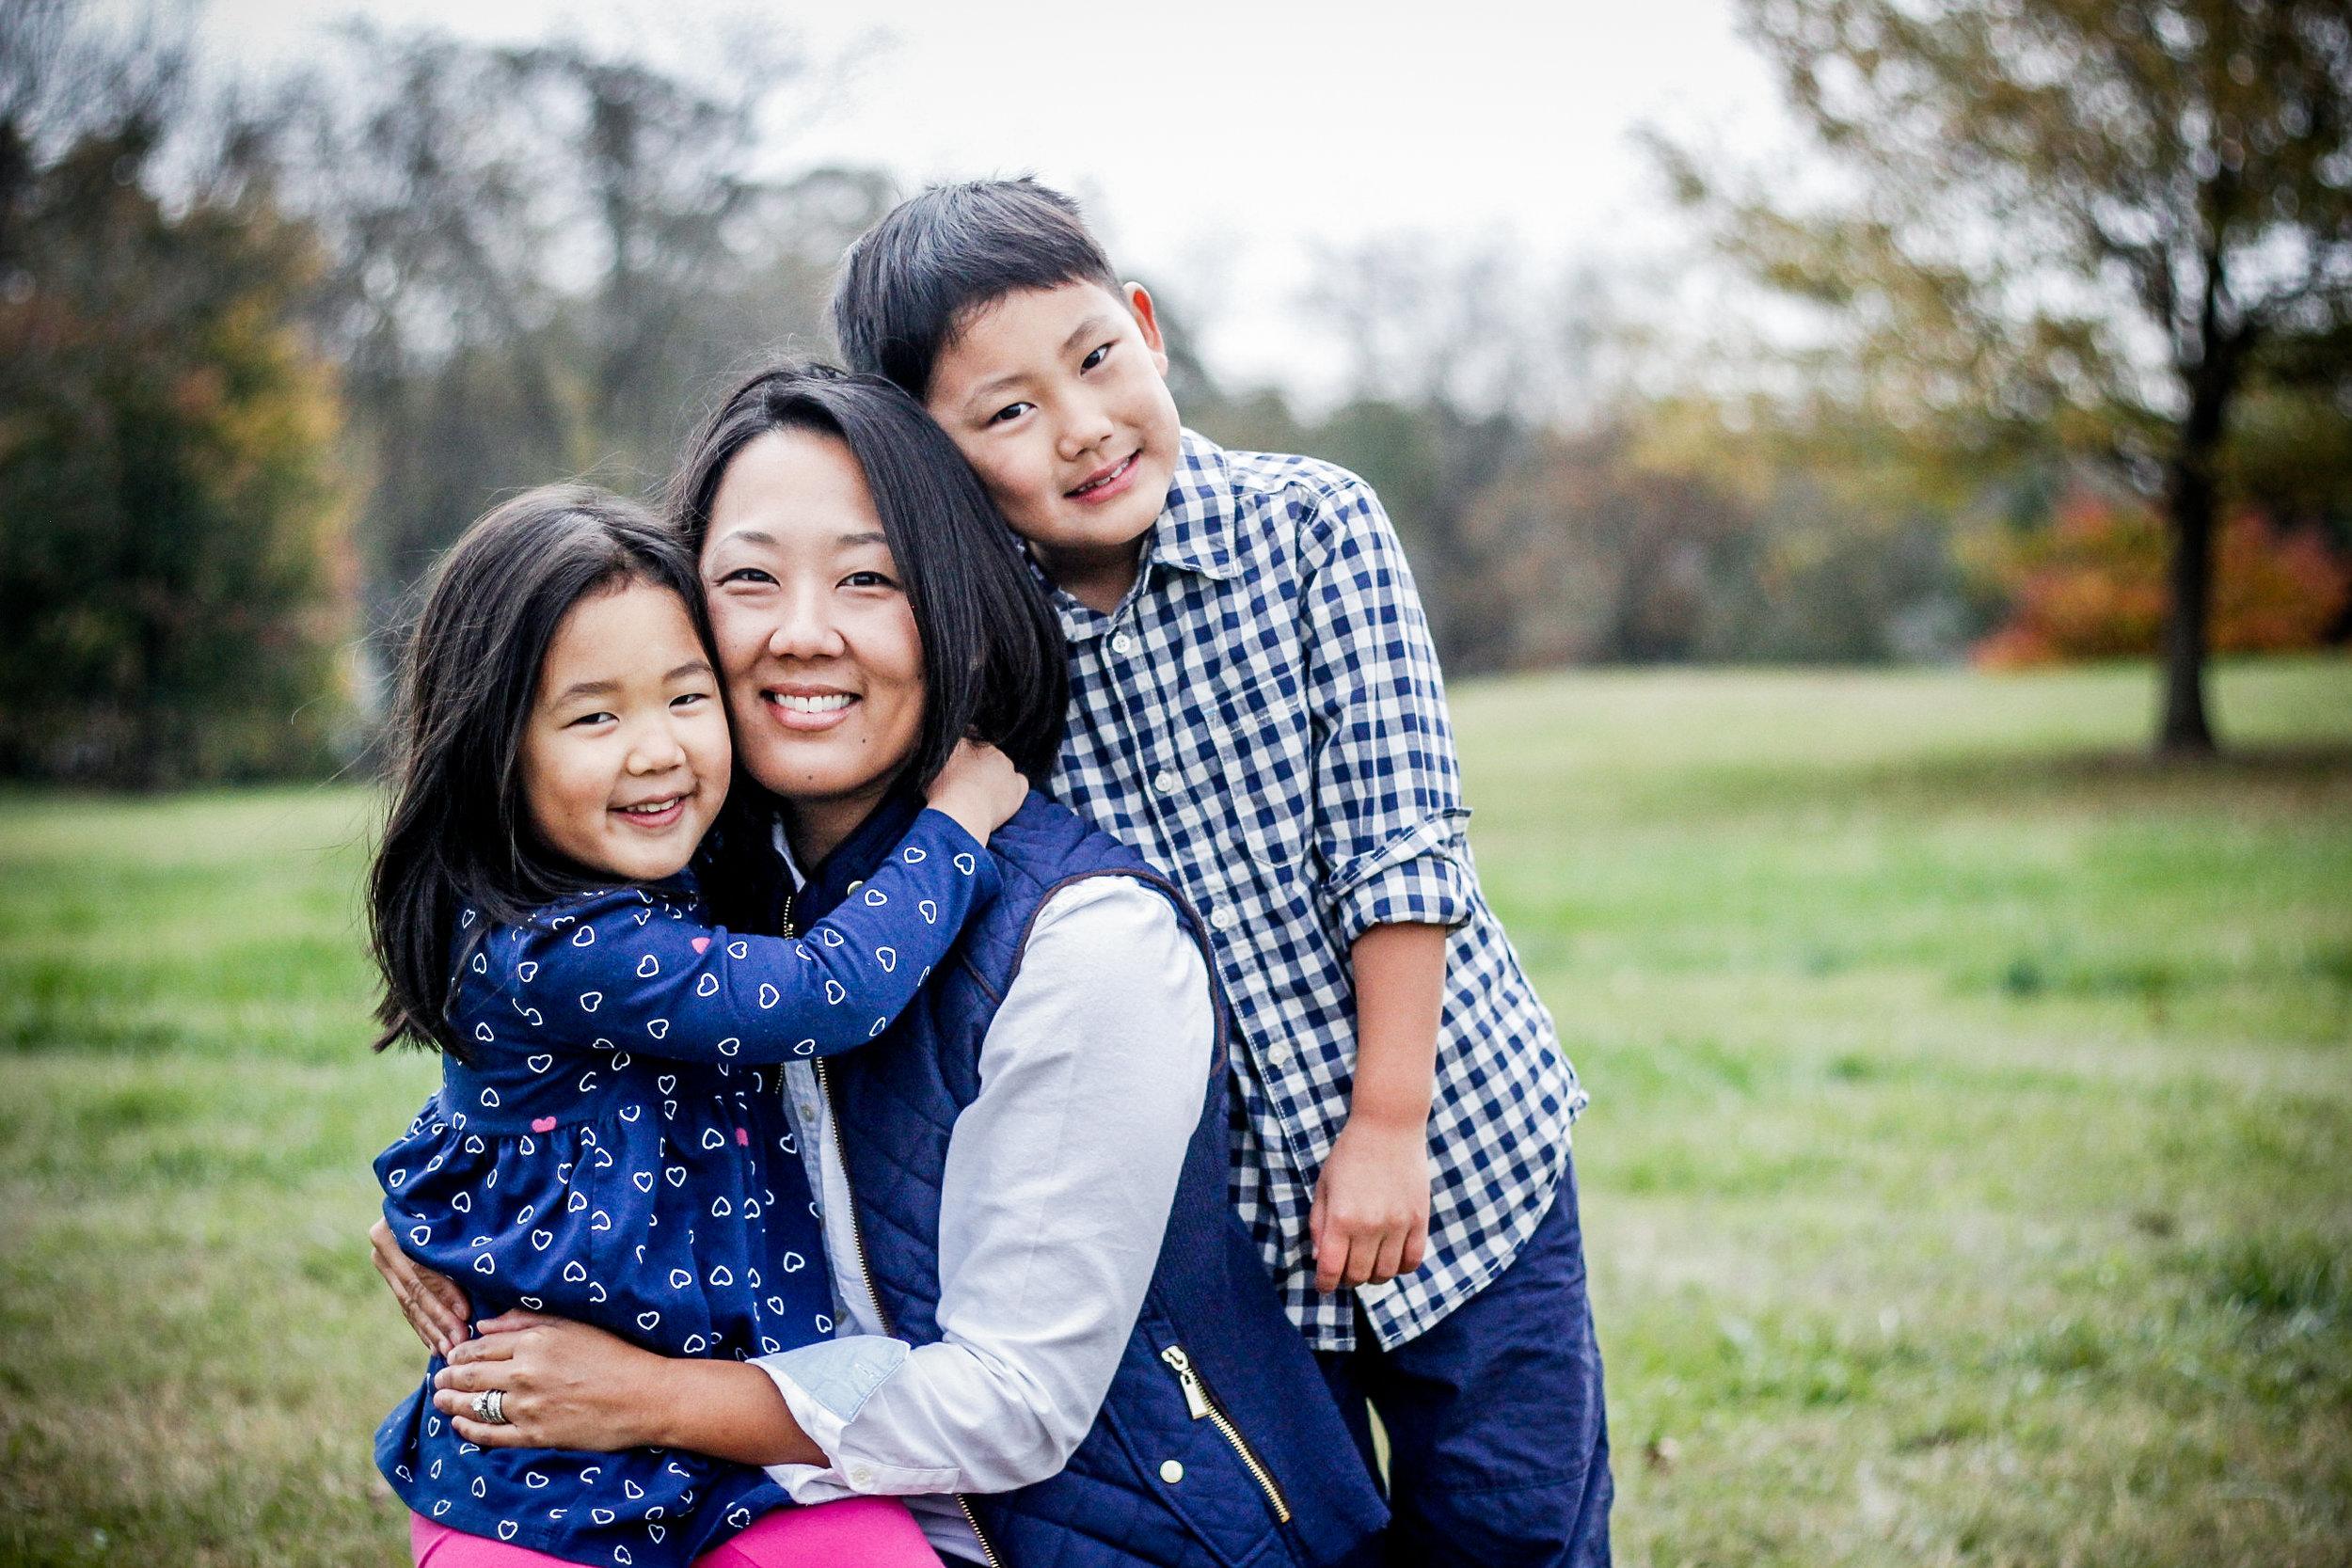 Lifestyle Portraits - FAMILY, HEADSHOTS, BRANDING